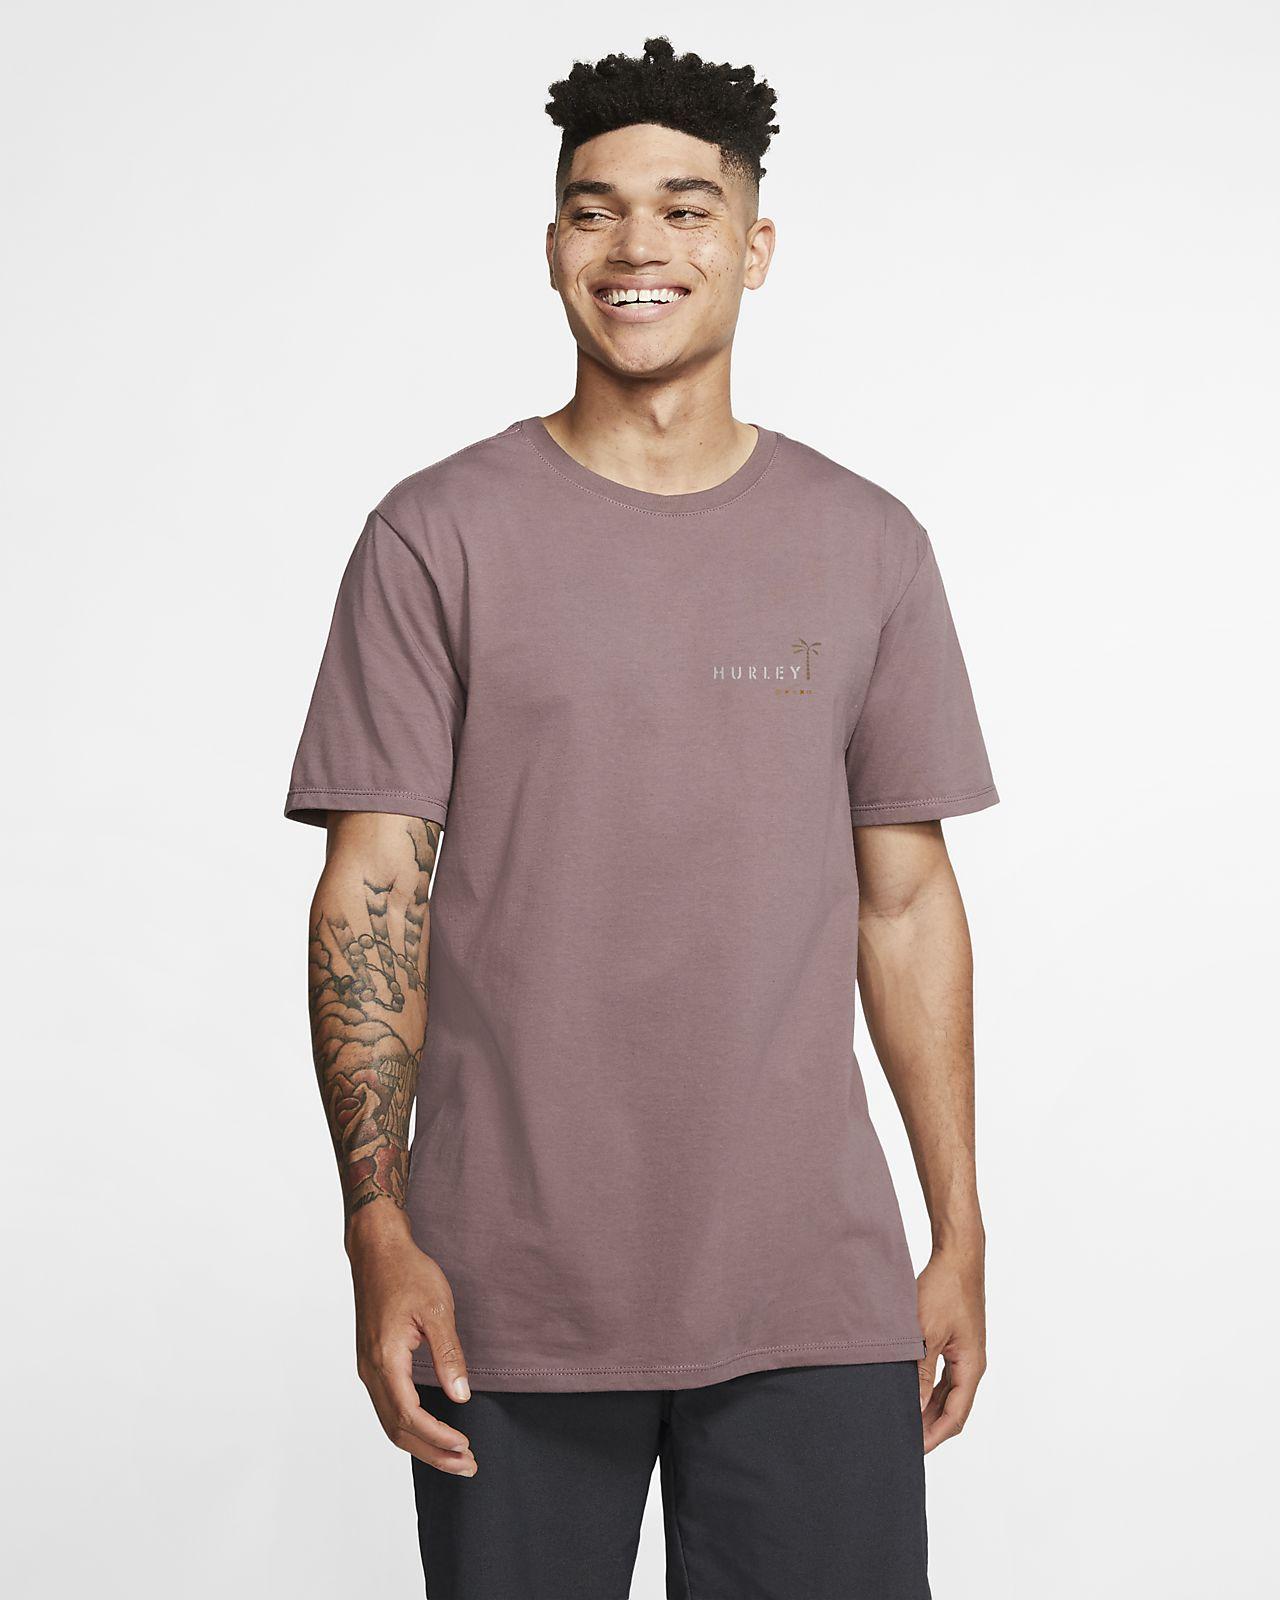 T-shirt Hurley Premium Tropical Mindstate para homem